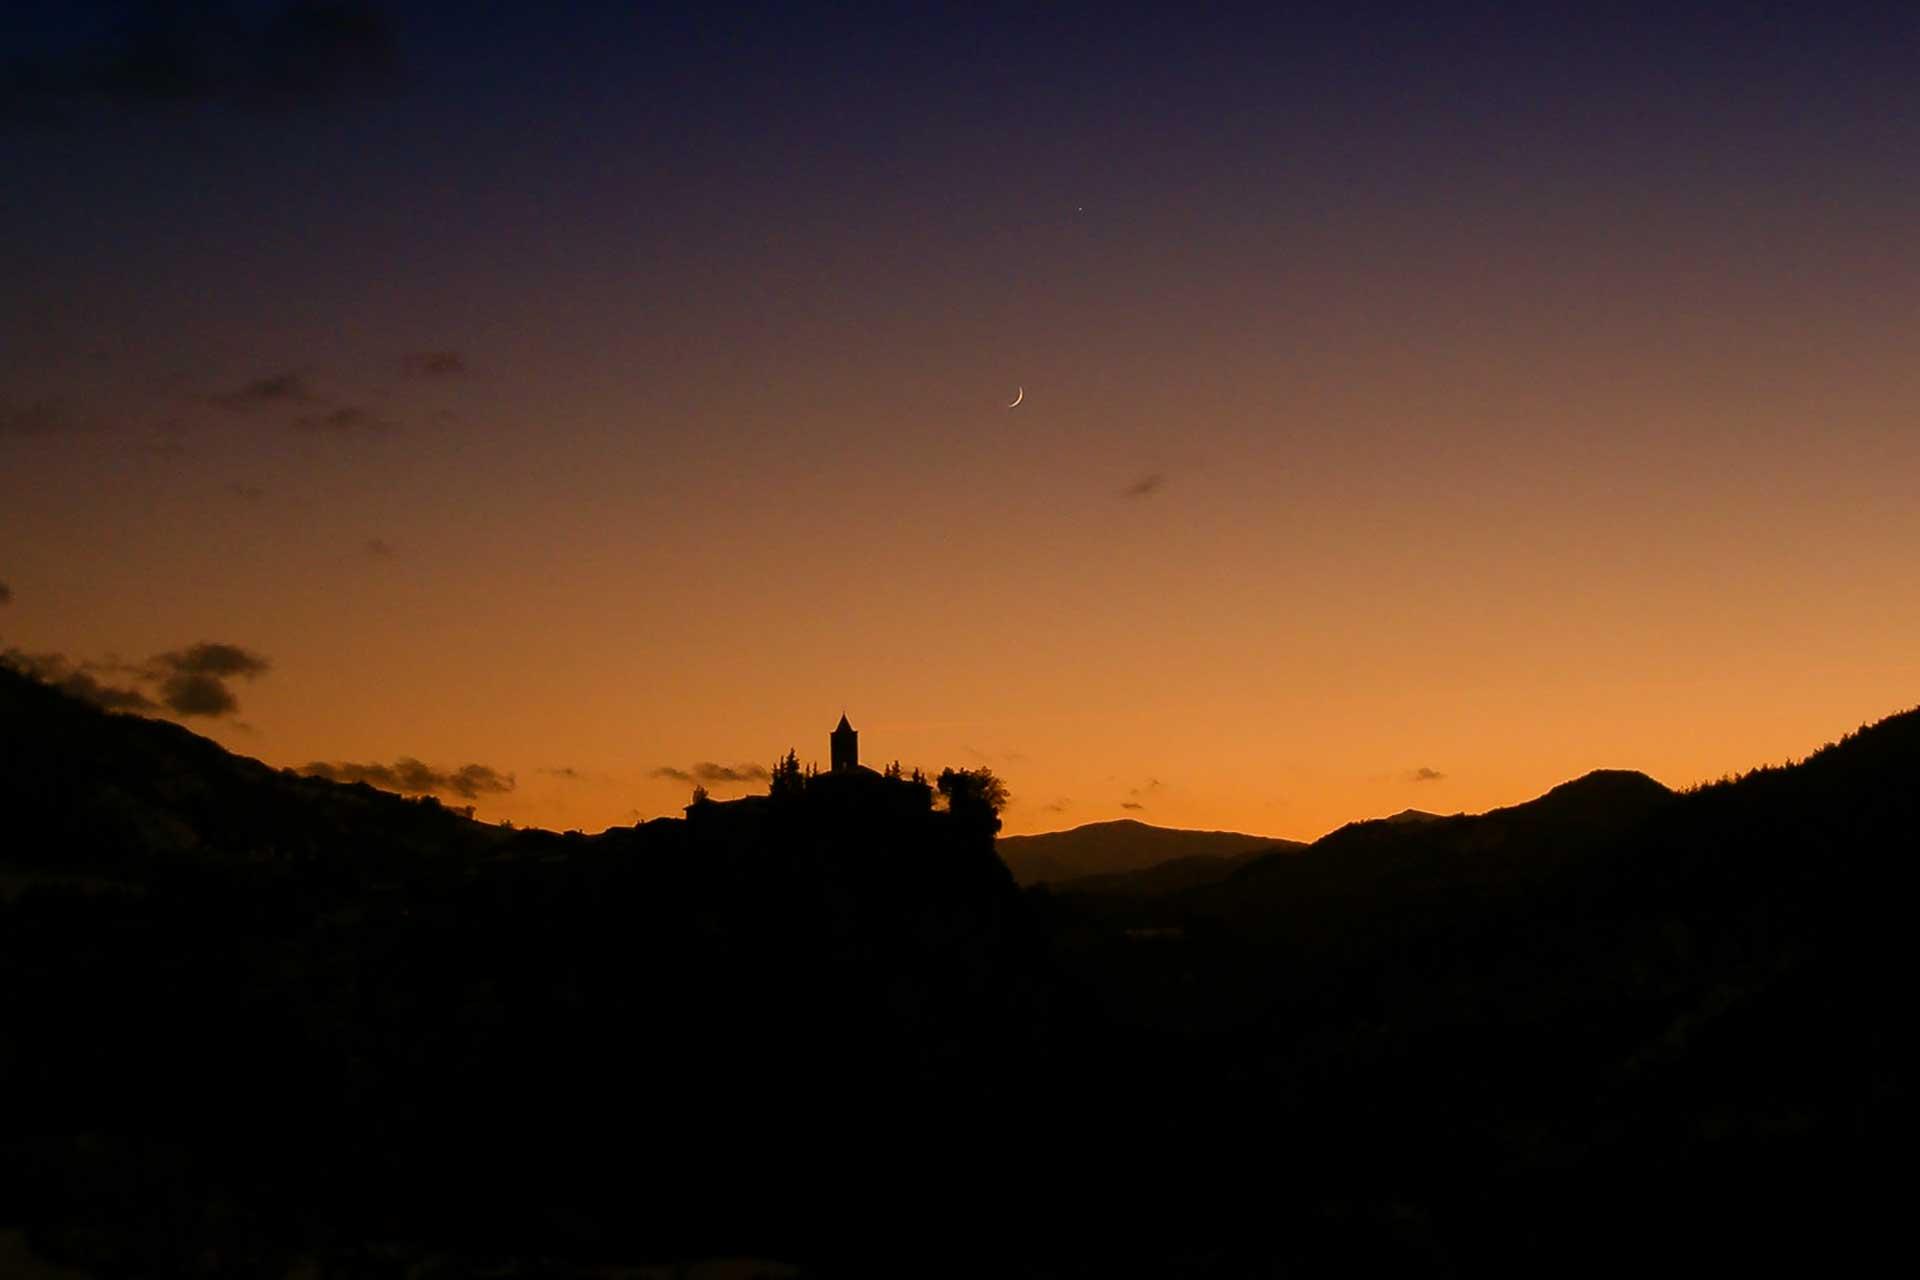 Castel_trosino>